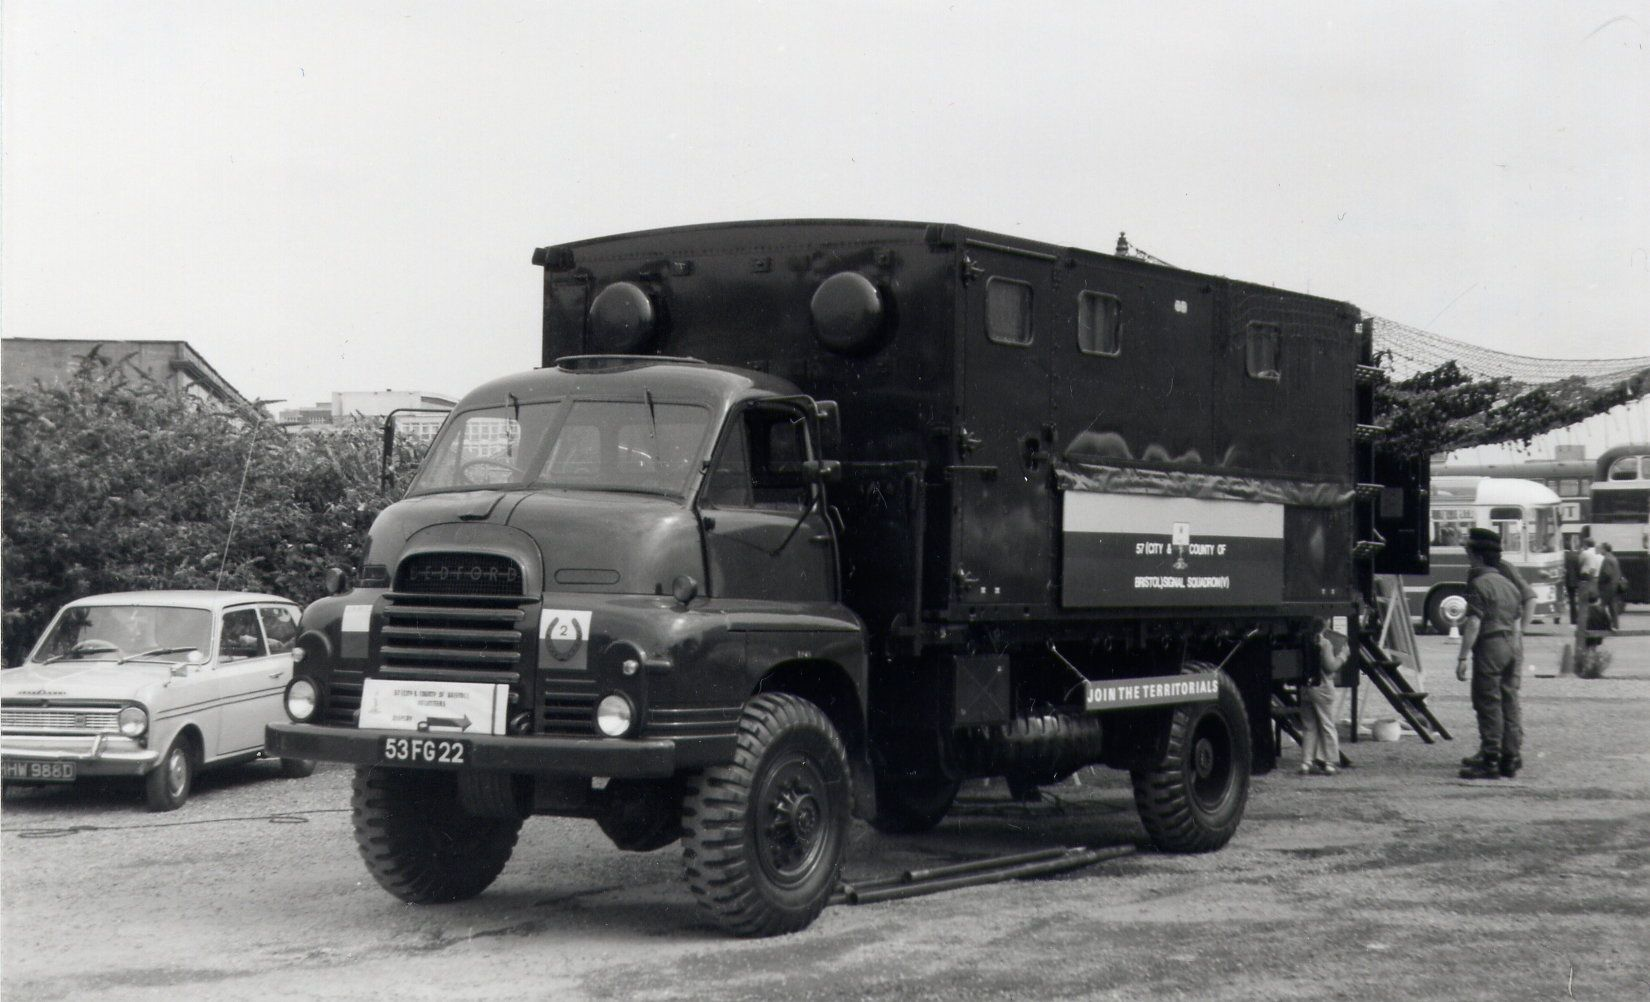 bedfordrl3ton4x4office53fg22 Bedford truck